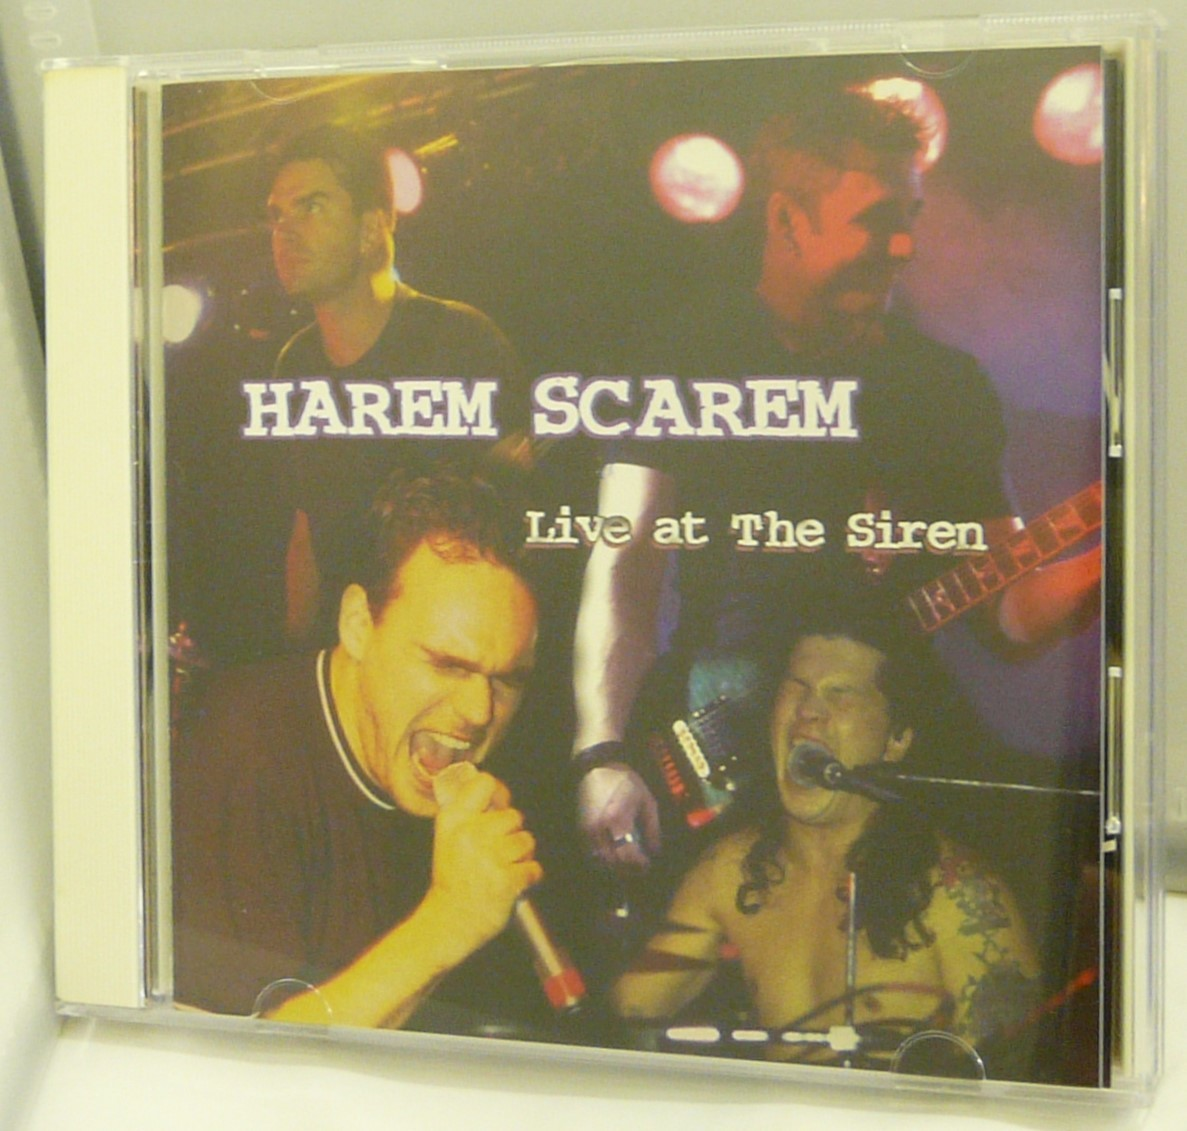 CD♪USED◎Harem Scarem RUBBER ◆ライヴ・アット・ザ・サイレン [初回限定盤](WPCR1736)◆ゆうメール発送◎管理CD1453_画像1